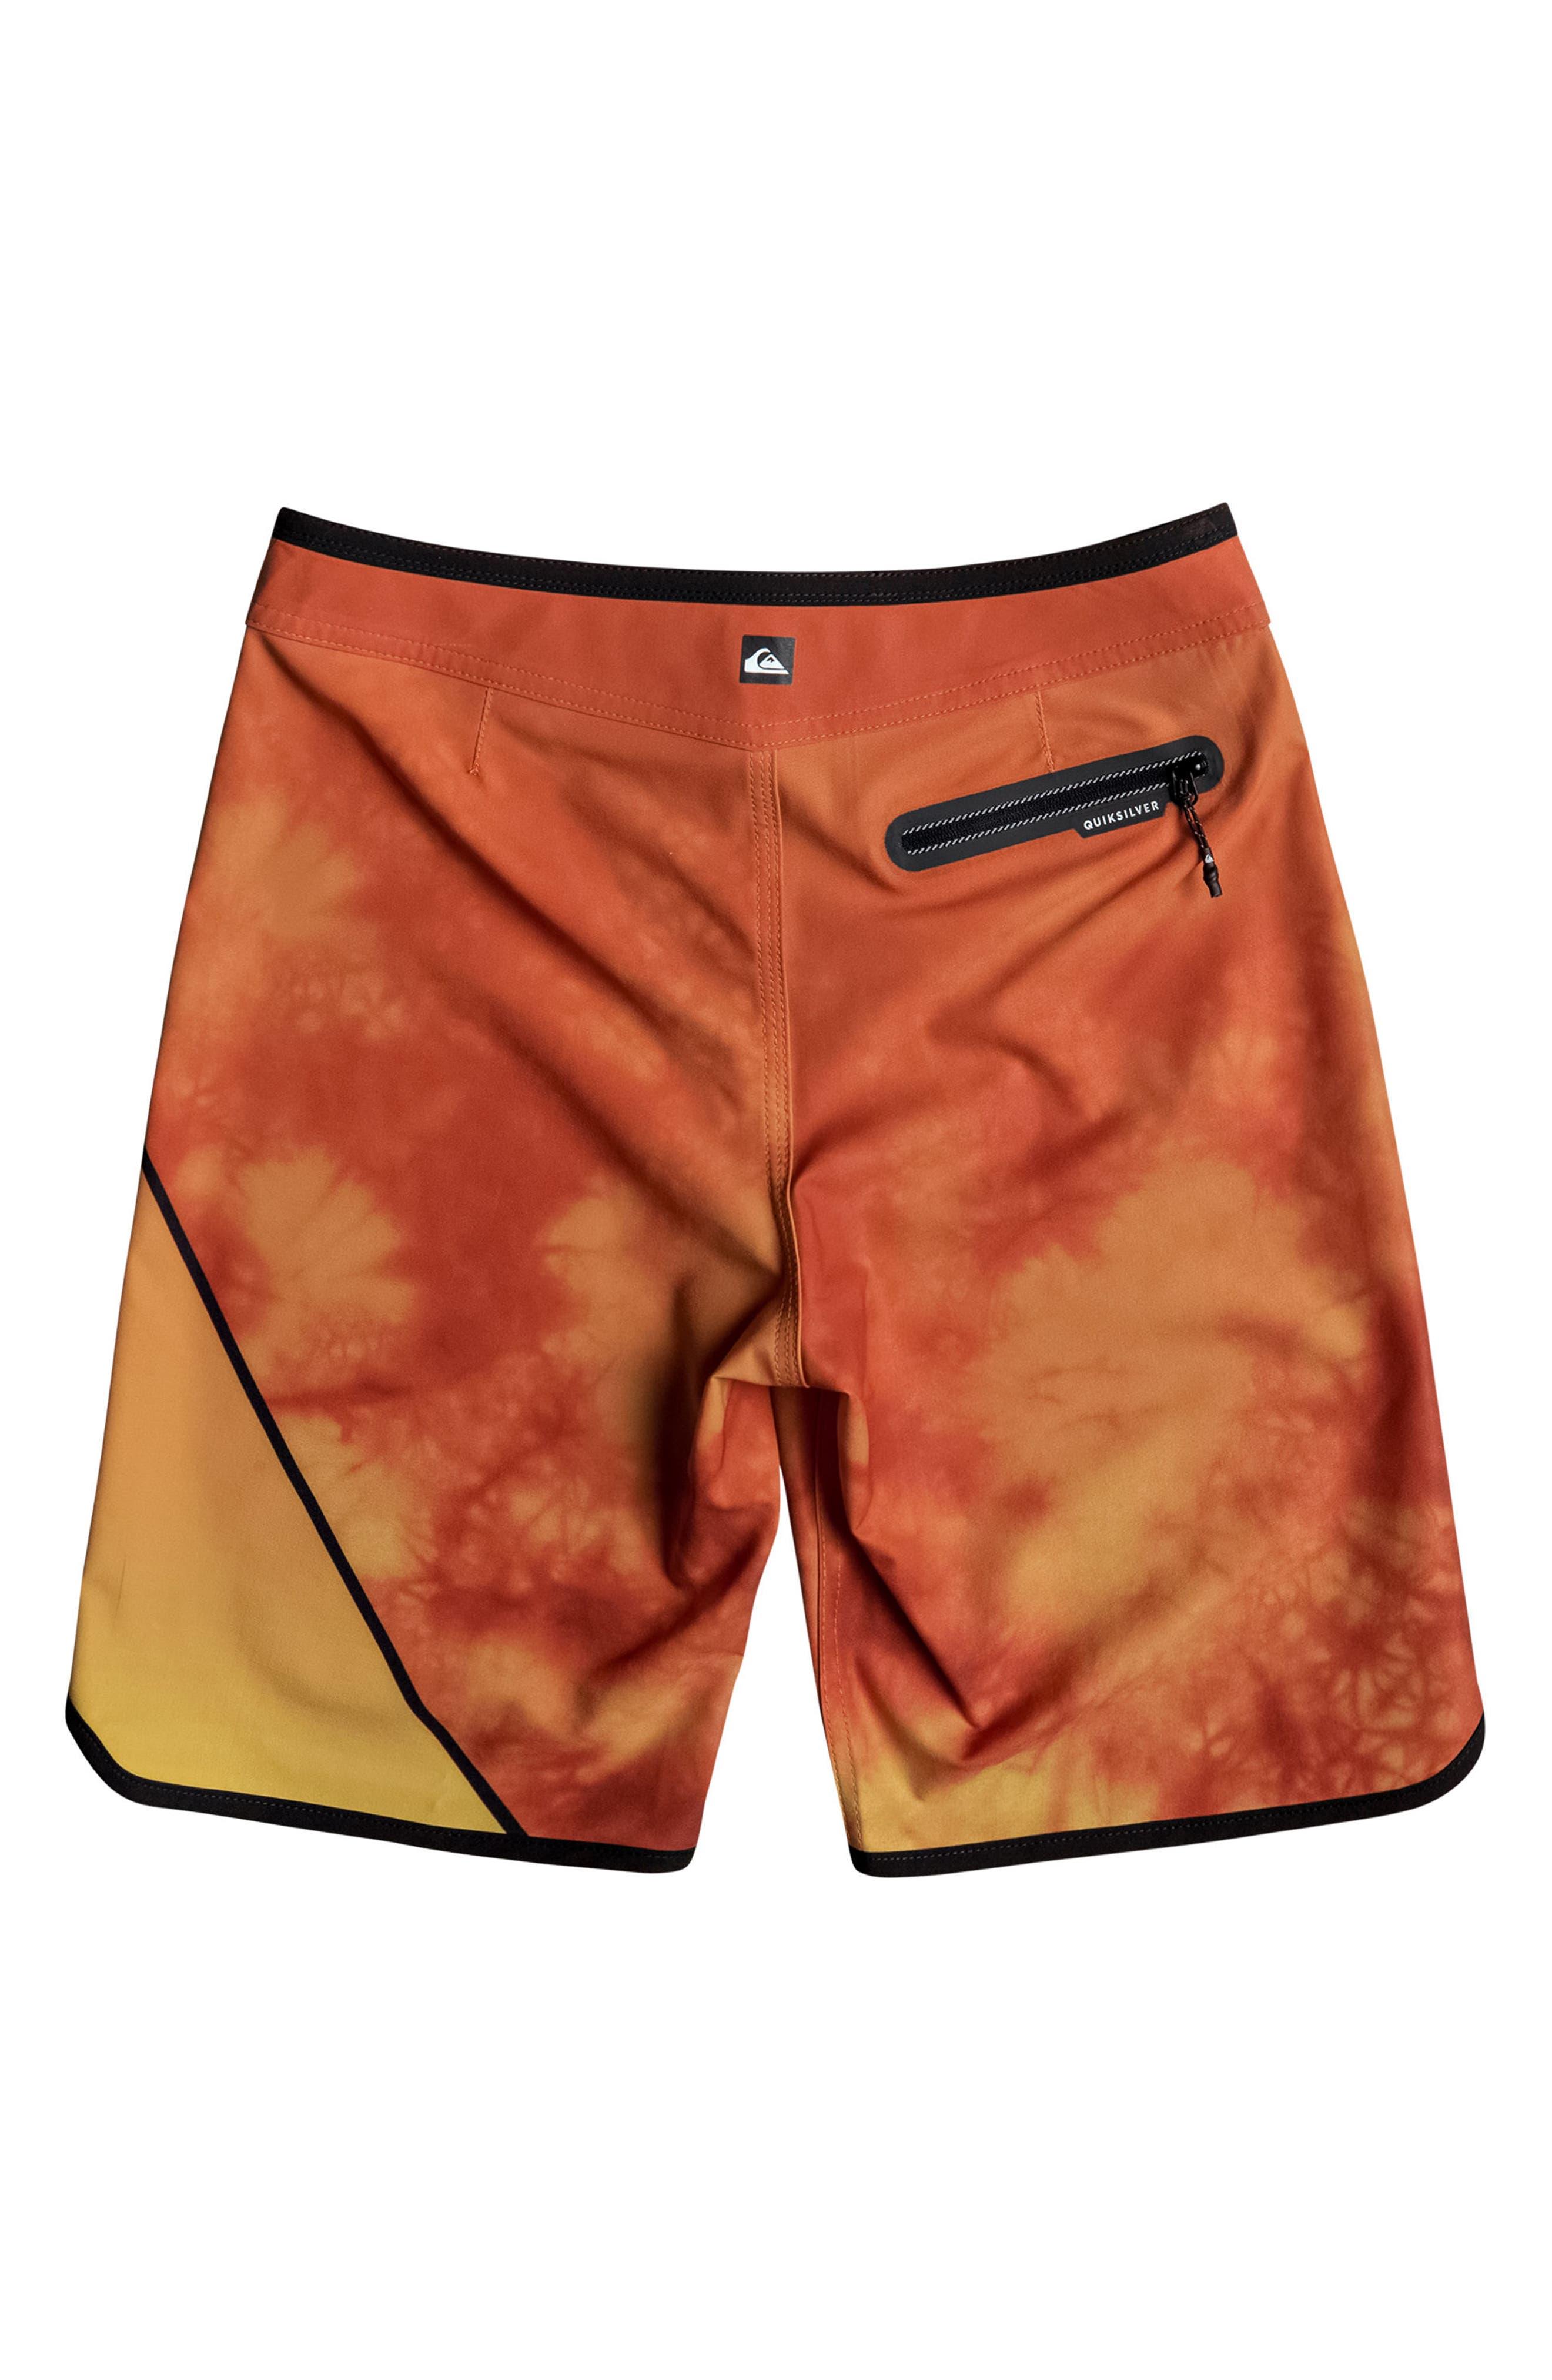 Alternate Image 2  - Quiksilver New Wave Board Shorts (Big Boys)